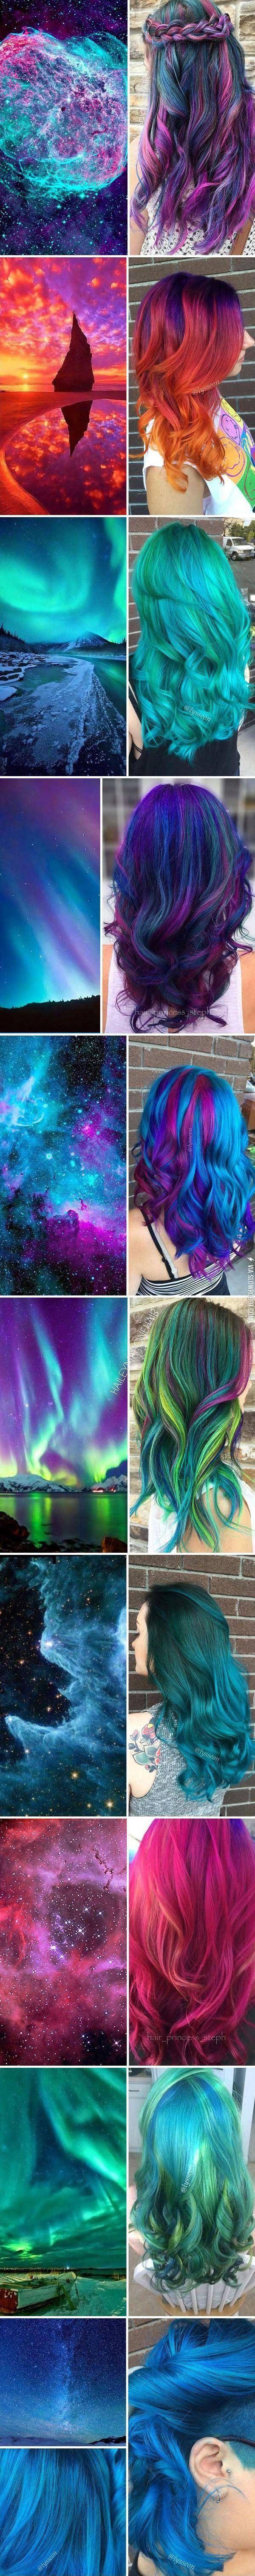 This ugalaxy hairu trend is spectacular galaxy hair hair trends